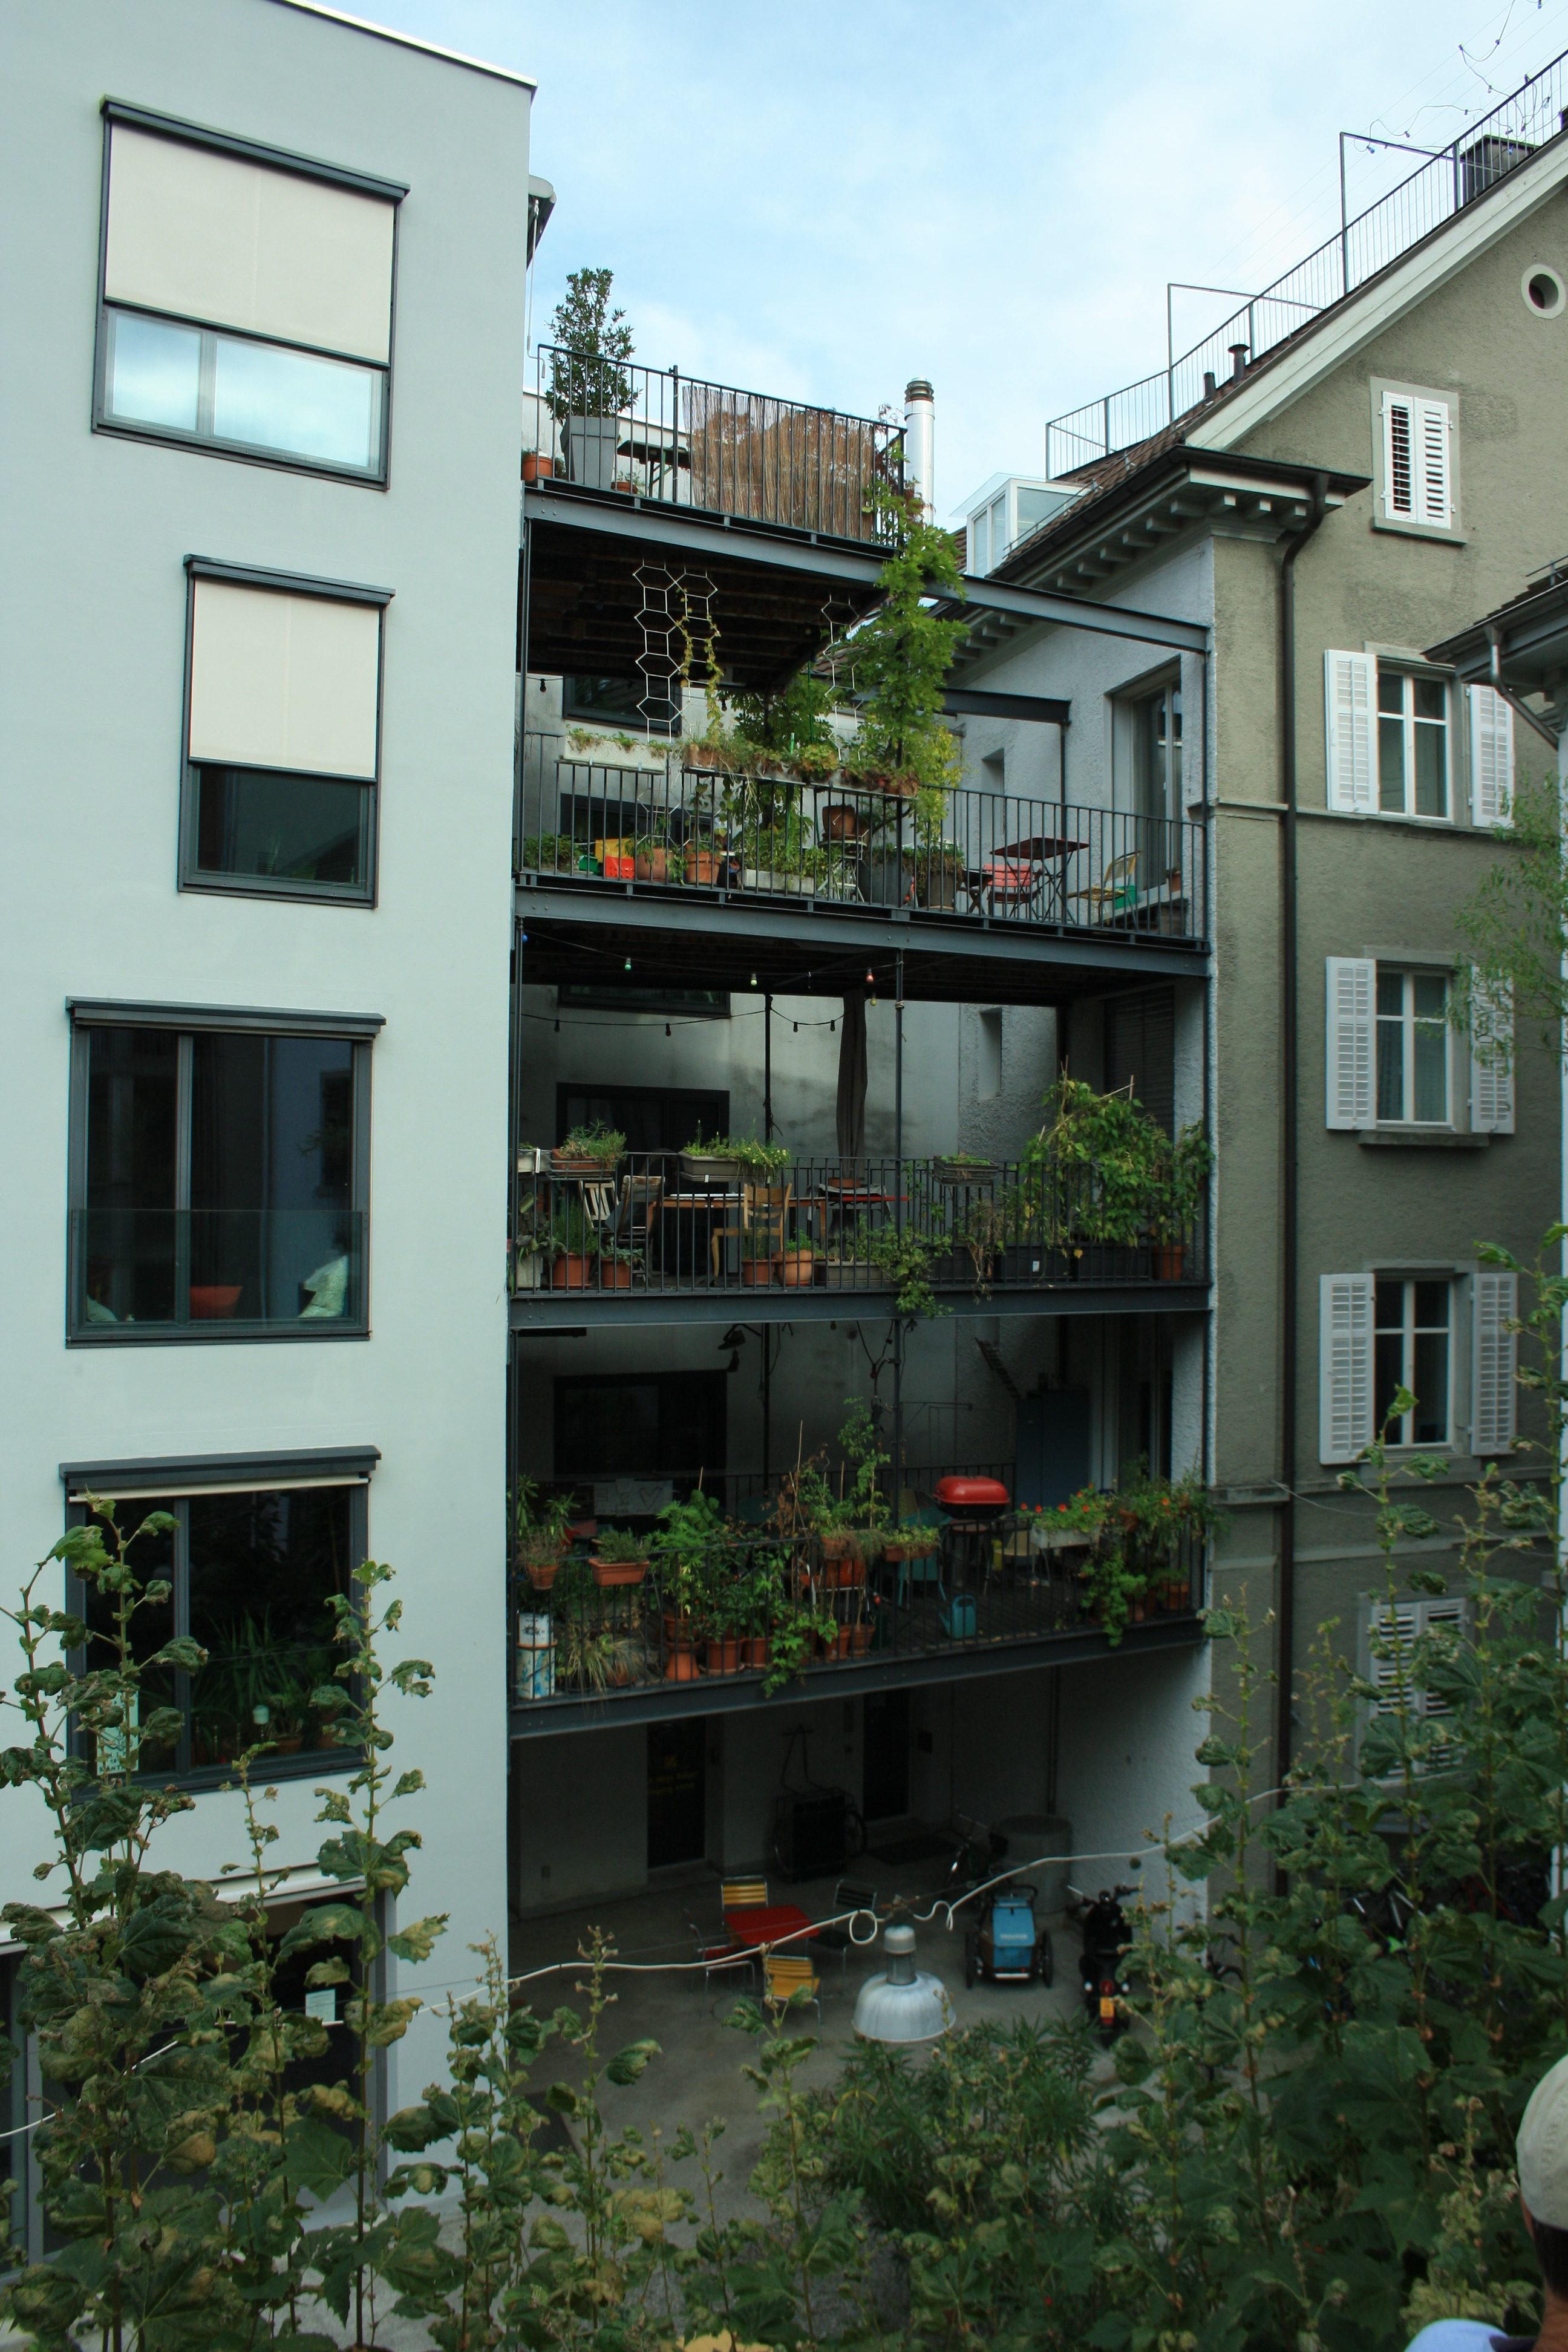 Wohnungsspaziergang @Dreieck